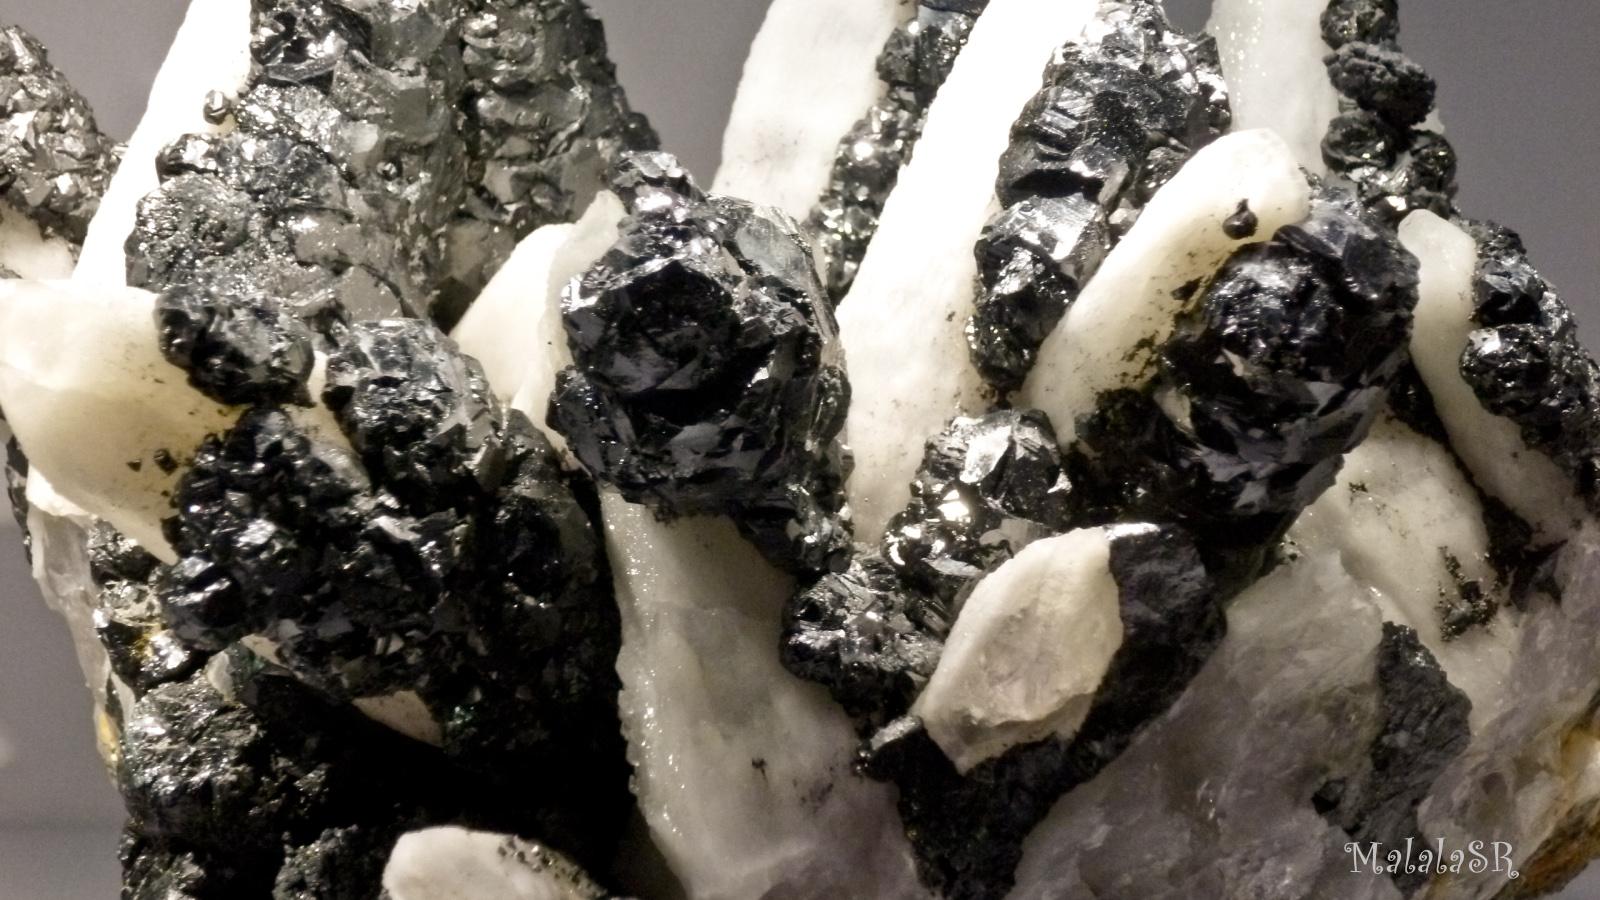 Stones malalasr 9